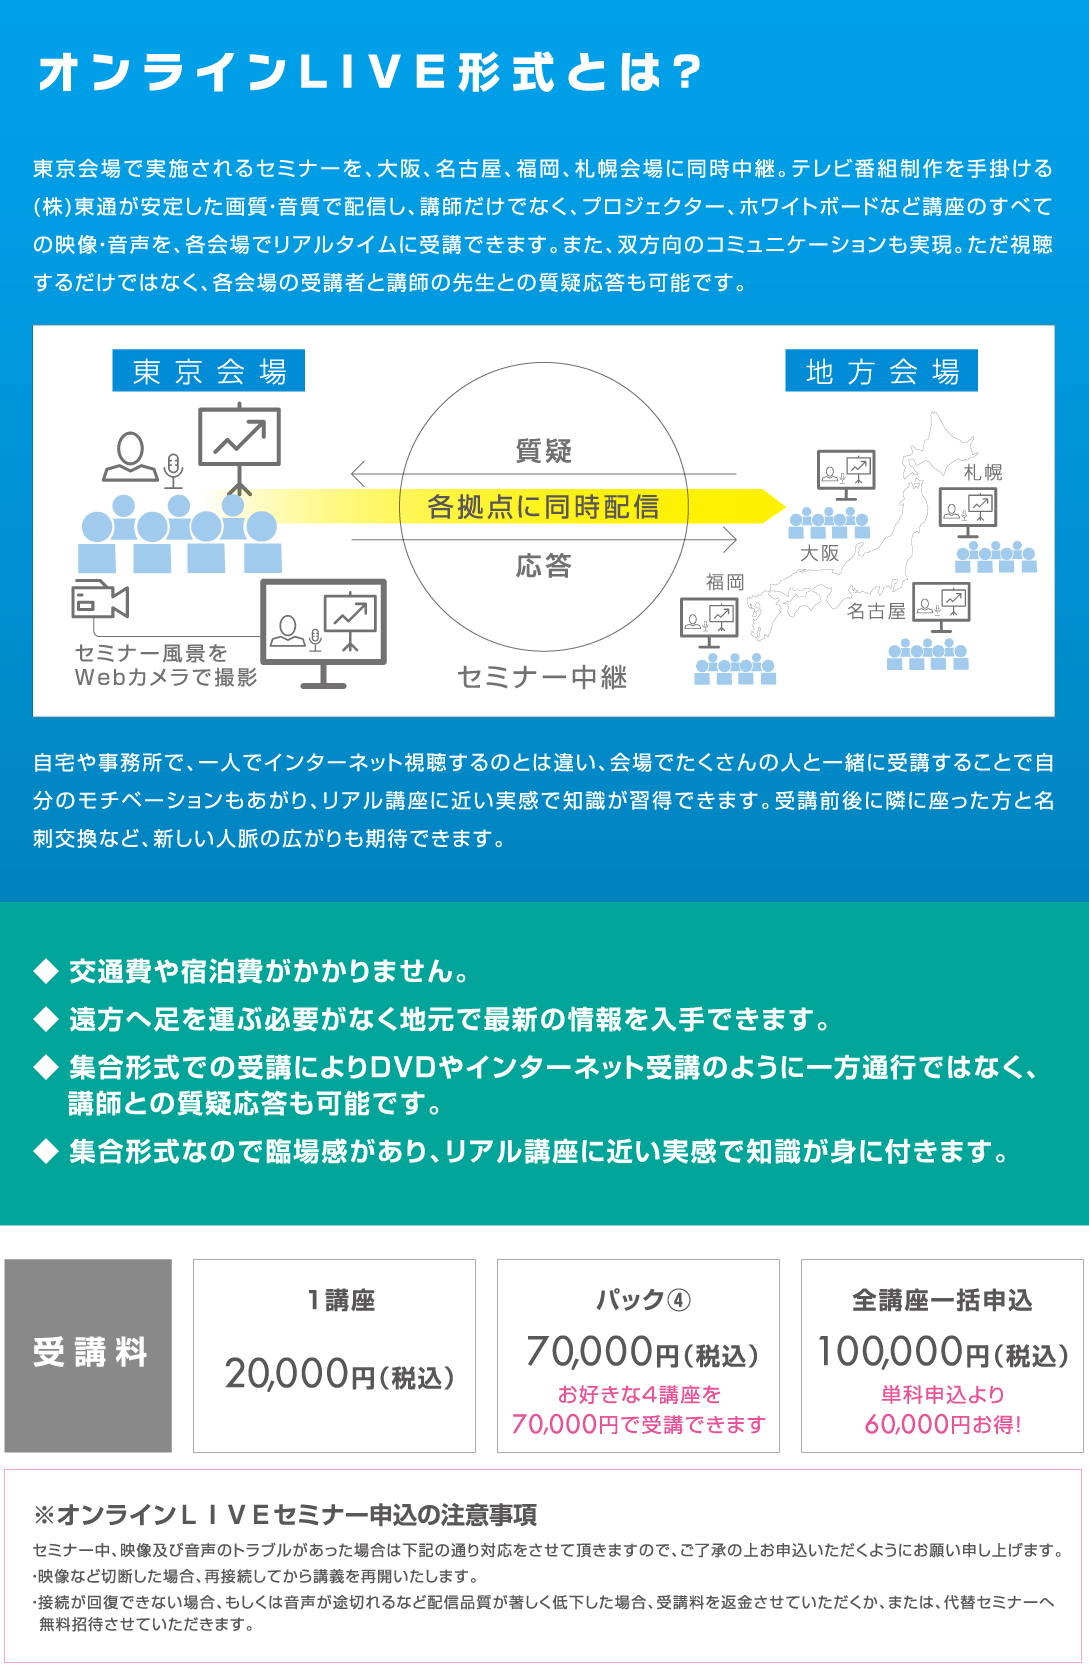 【TAC実務セミナー|オンラインLIVEセミナー】